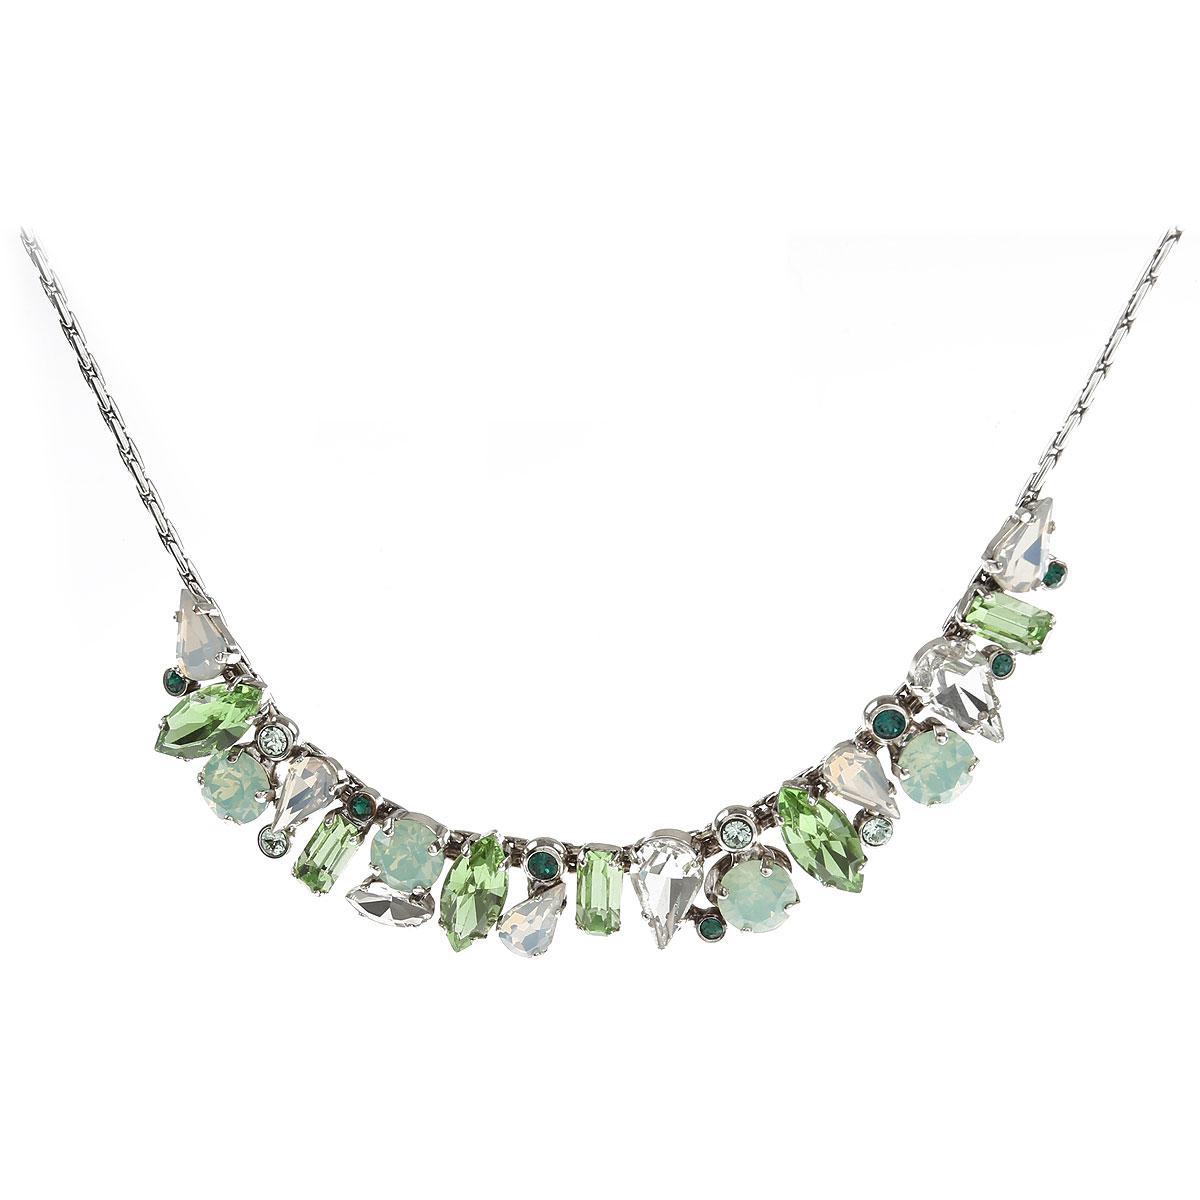 Dueci Bijoux Necklaces On Sale, Green, Silver, 2019